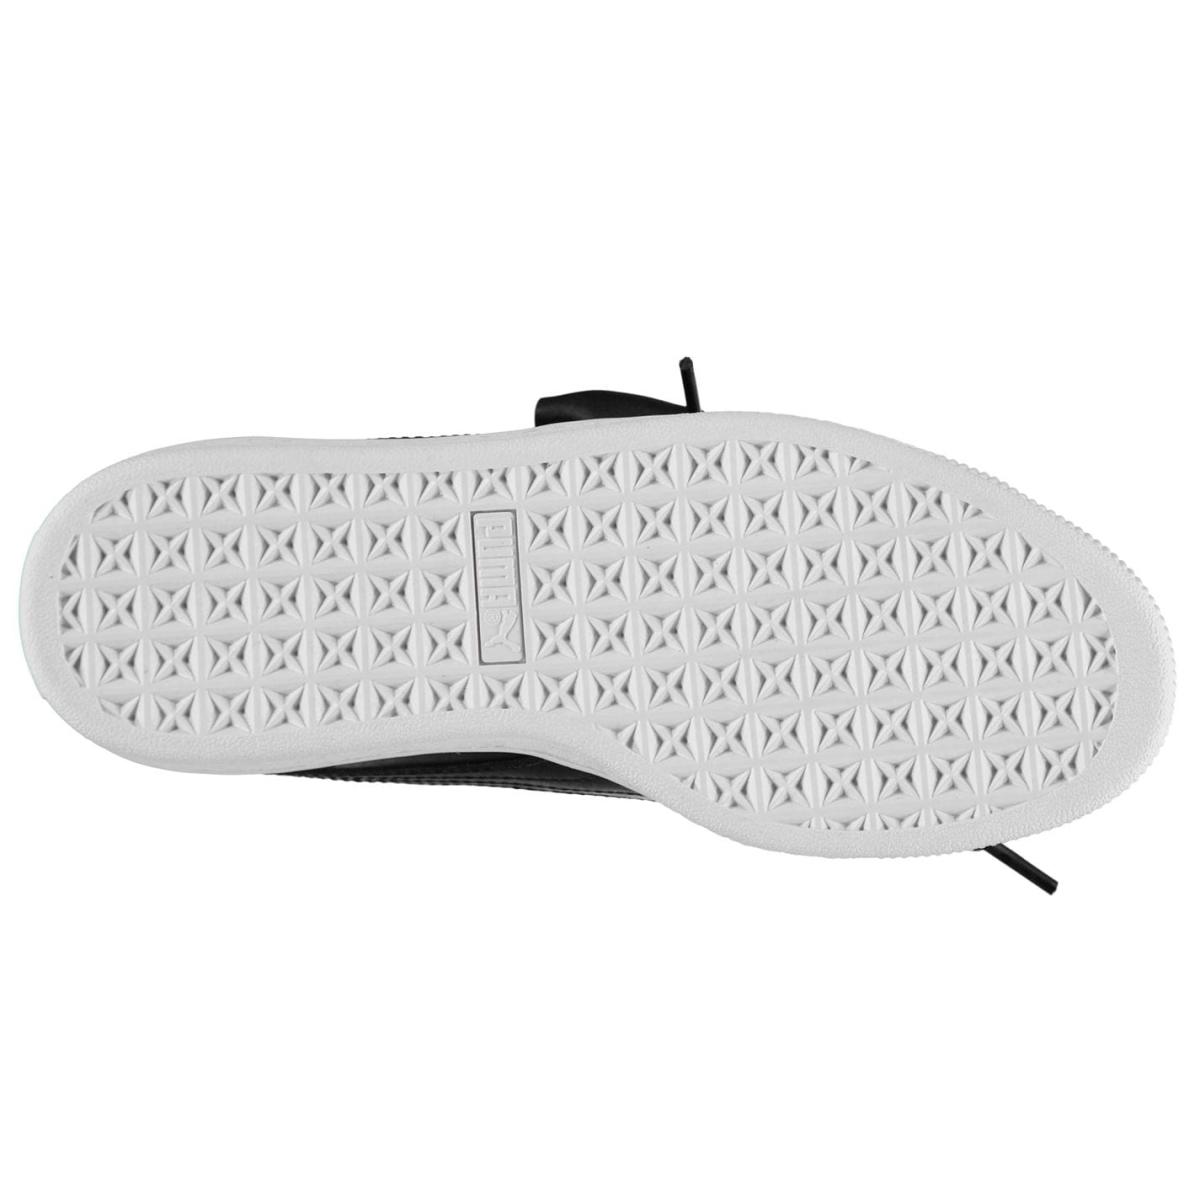 Puma-Basket-Turnschuhe-Damen-Sneaker-Sportschuhe-Laufschuhe-9081 Indexbild 3